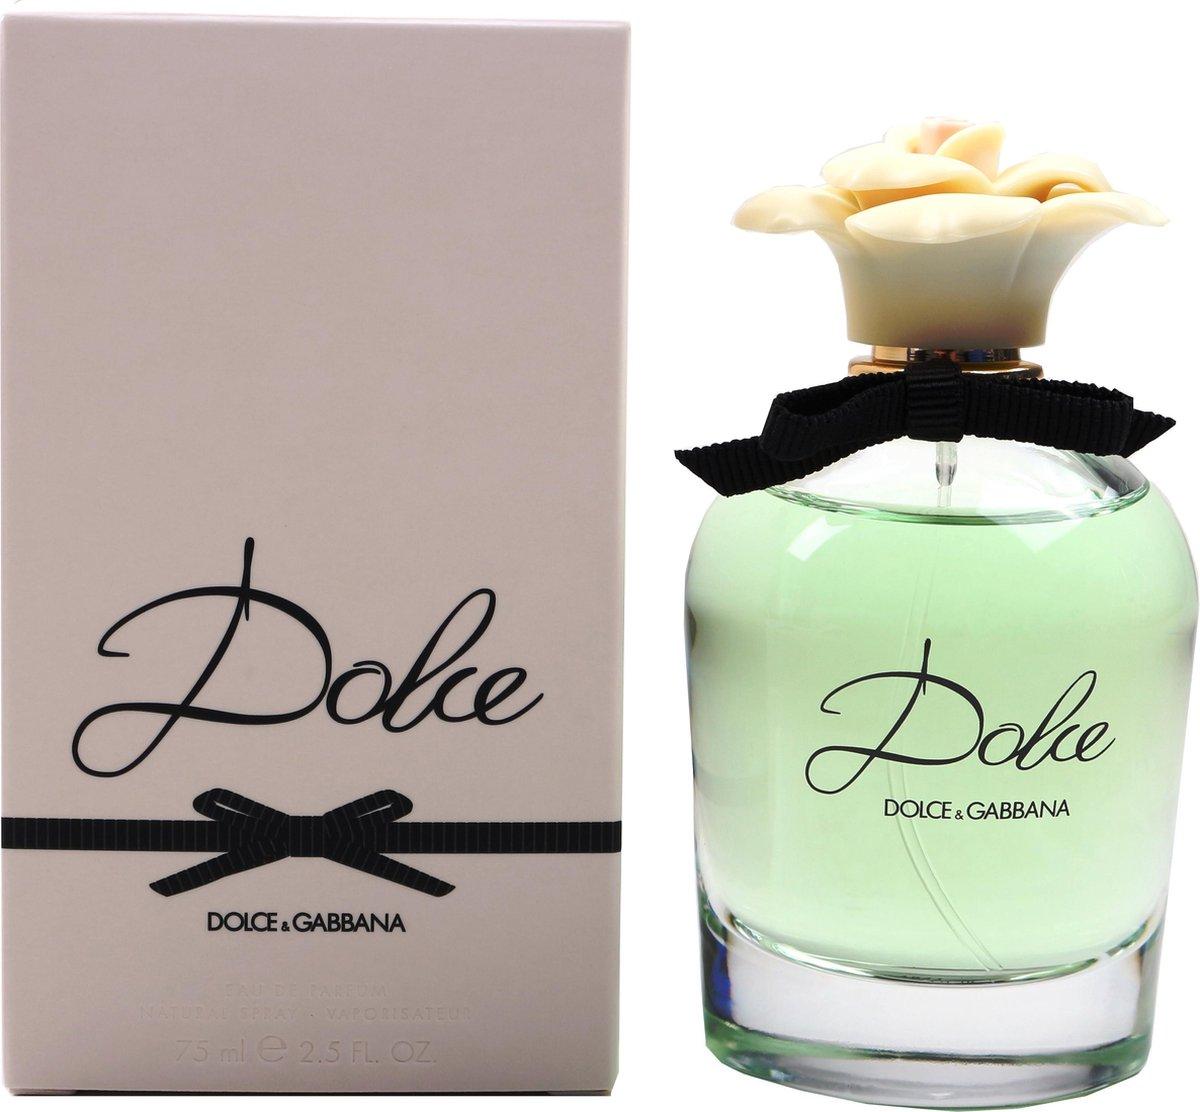 Dolce & Gabbana Dolce - 75 ml - Eau de Parfum - Dolce & Gabbana